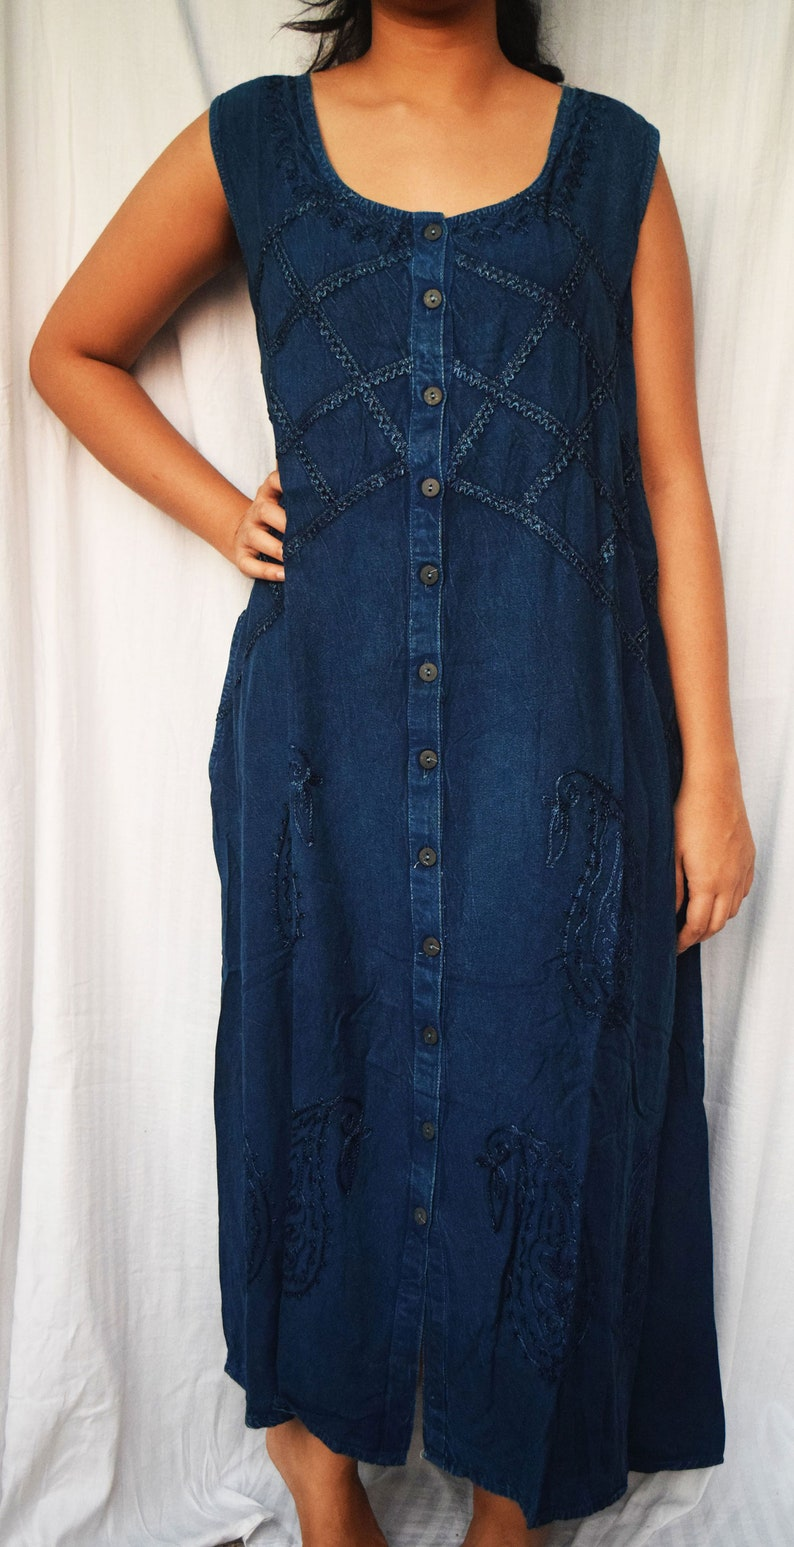 All Season Dress Free Size Bohemian Loungers Plus Size Dress Hippie Dress Holiday Dress Women Dress Long Maxi Dress Rayon Dress